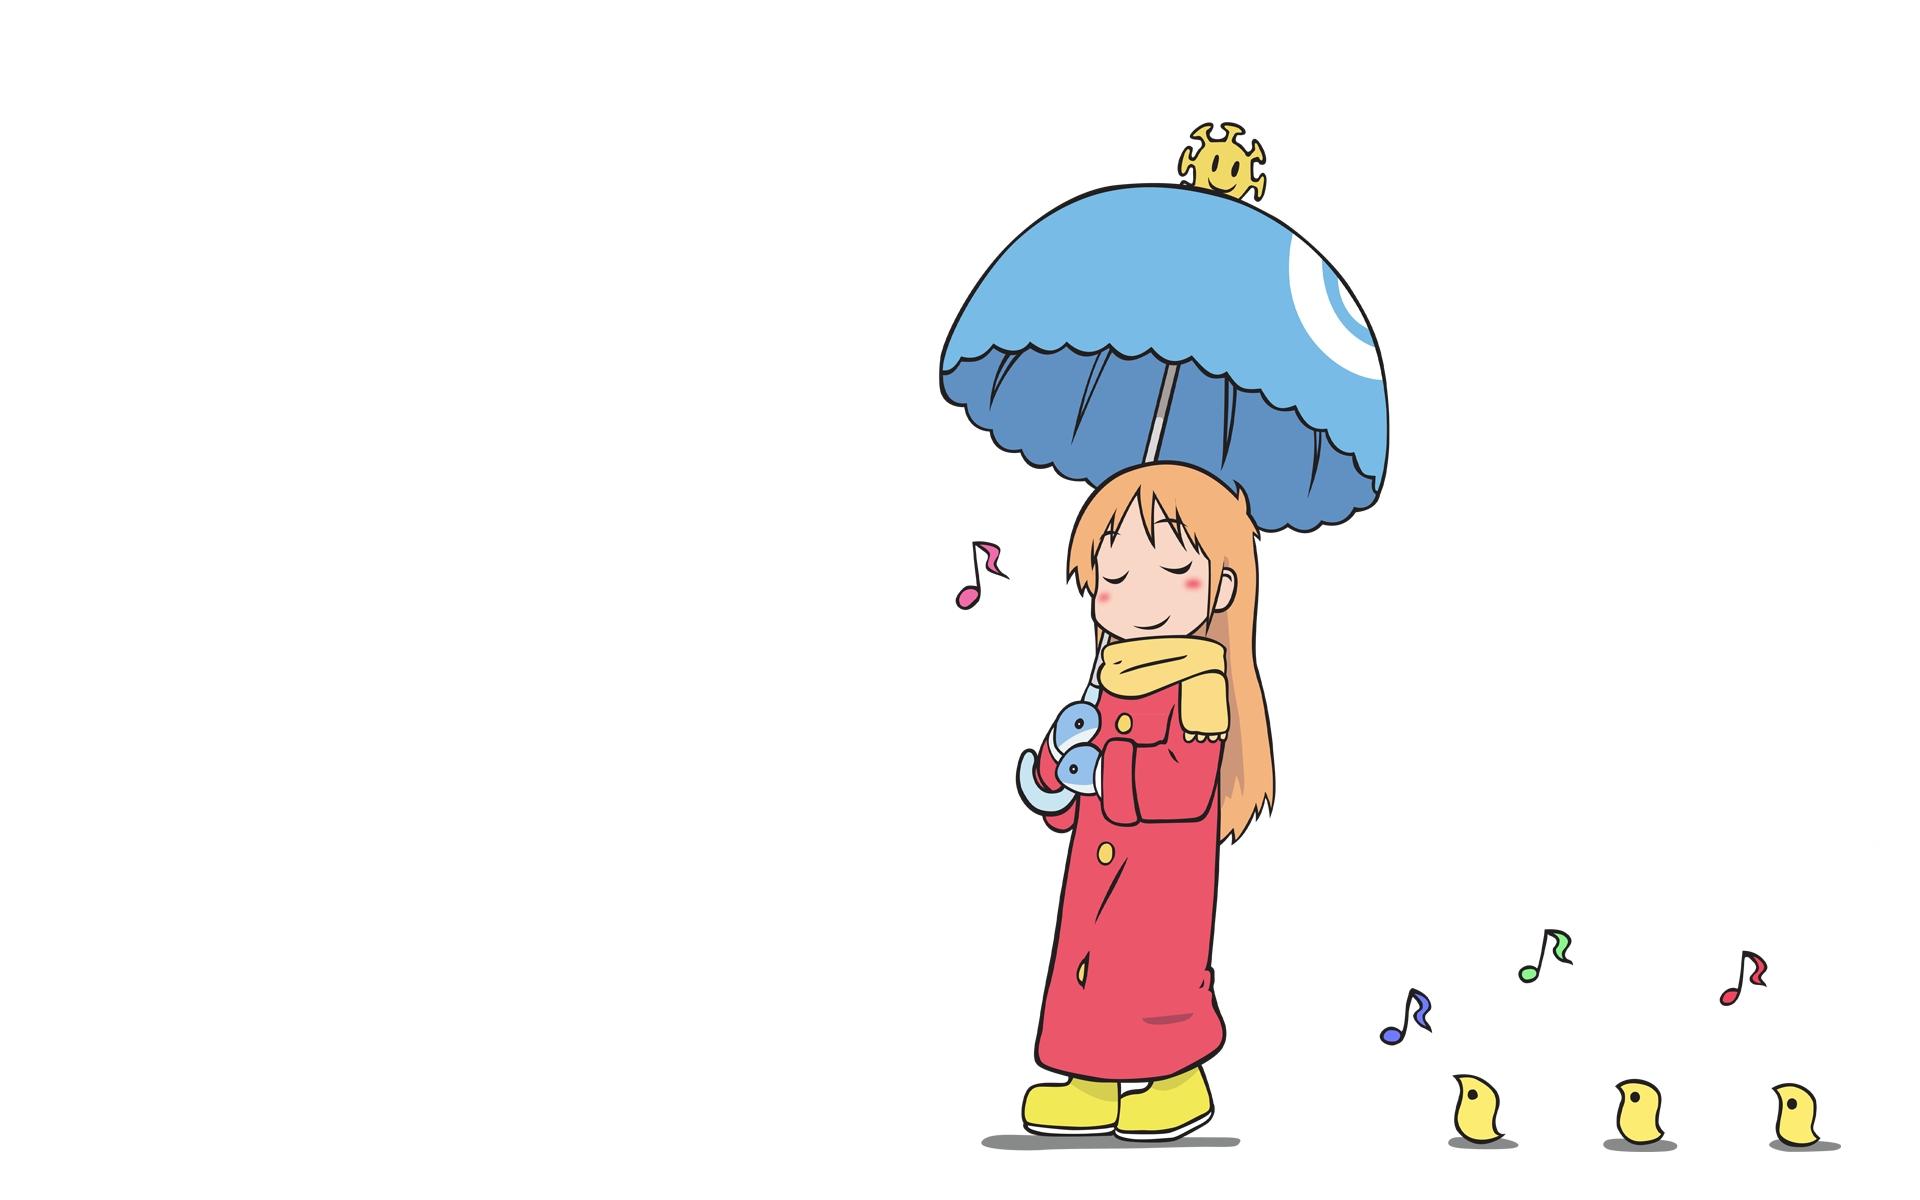 Anime 1920x1200 Shinonome Hakase Nichijou anime simple background simple